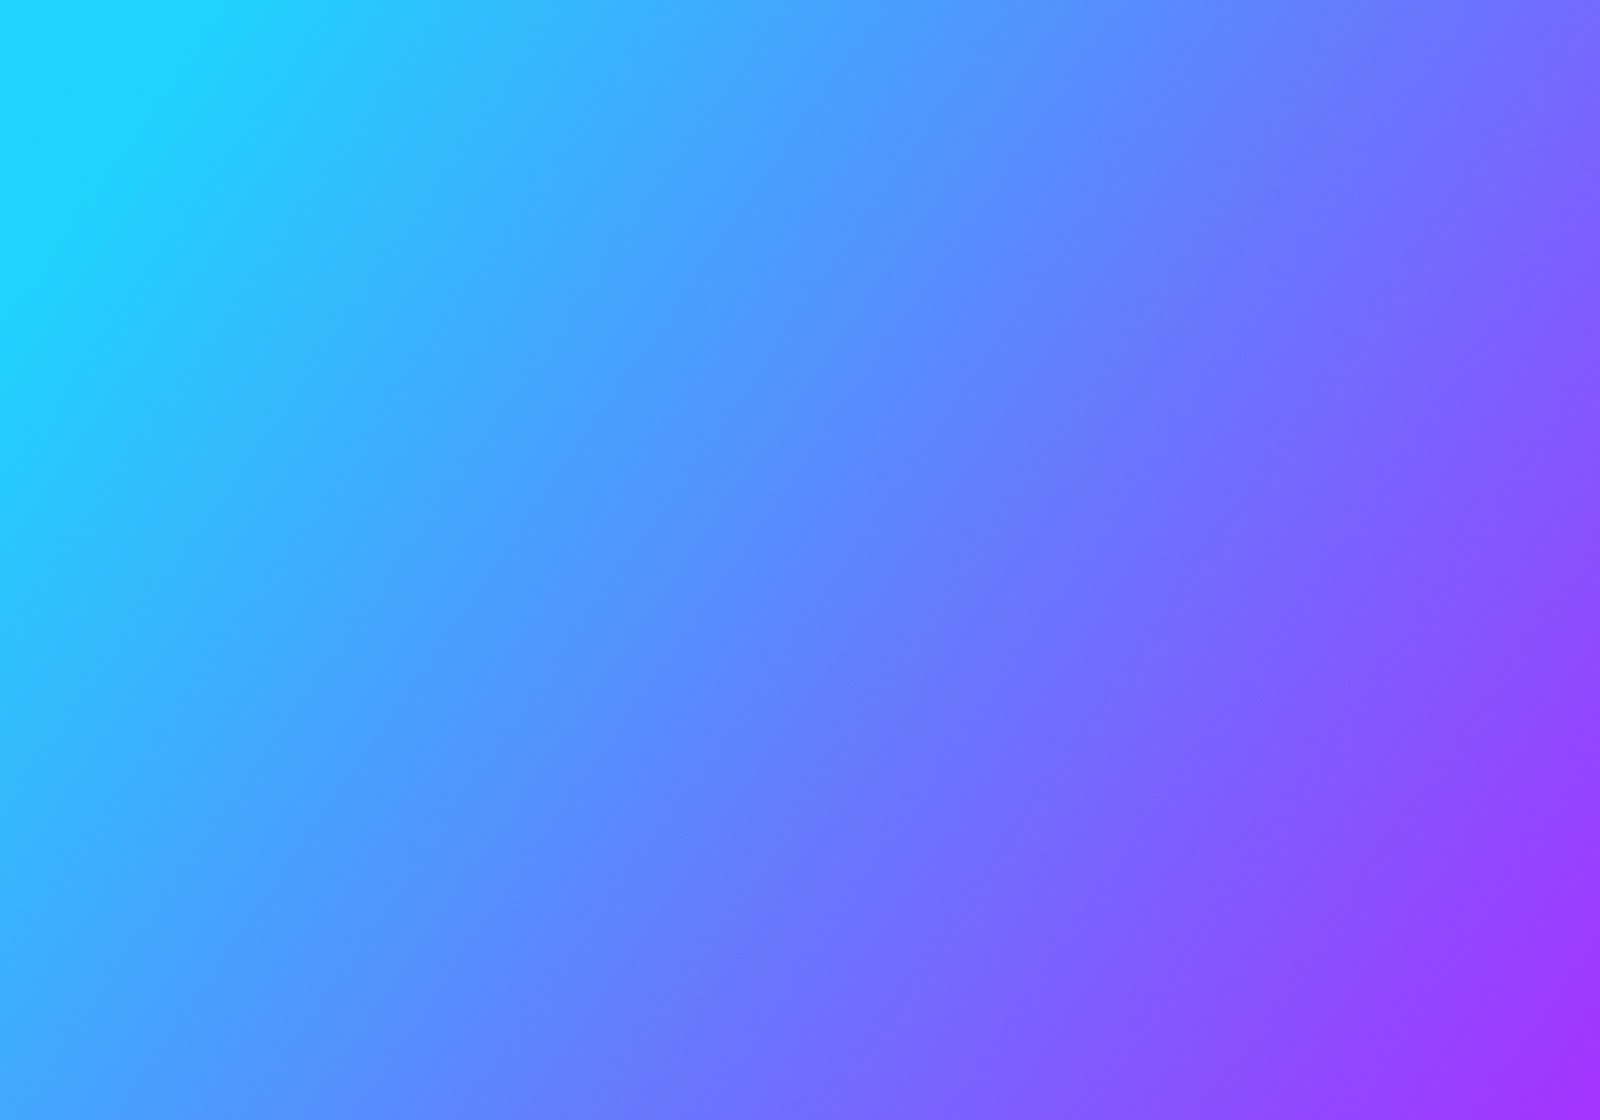 Blue color gradiant that fades into a purple